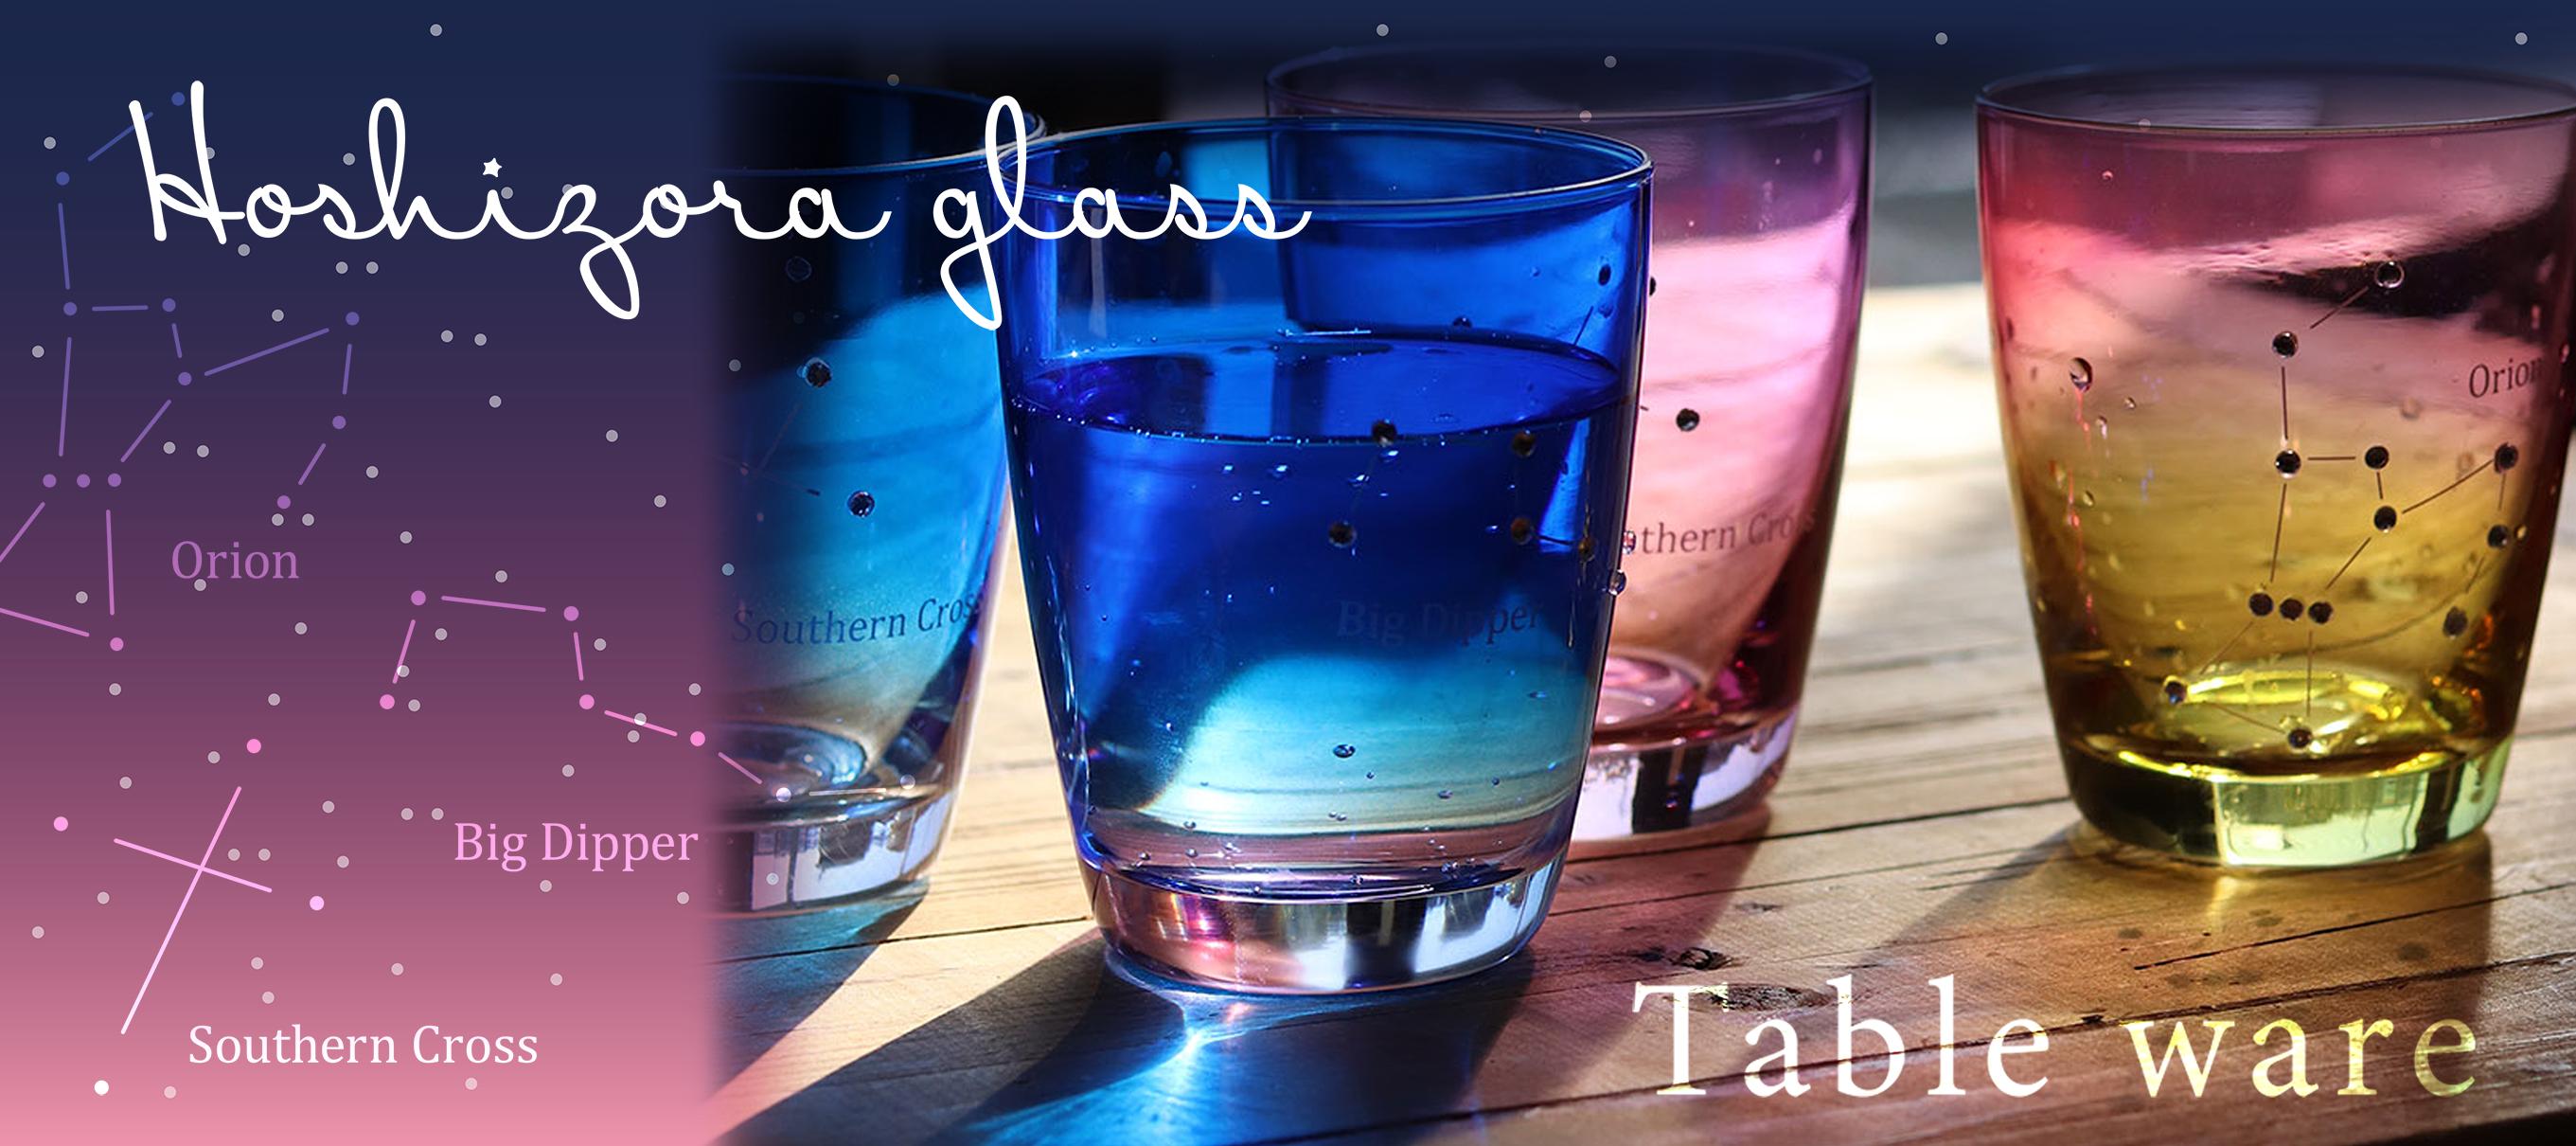 Hoshizora glass Tale ware